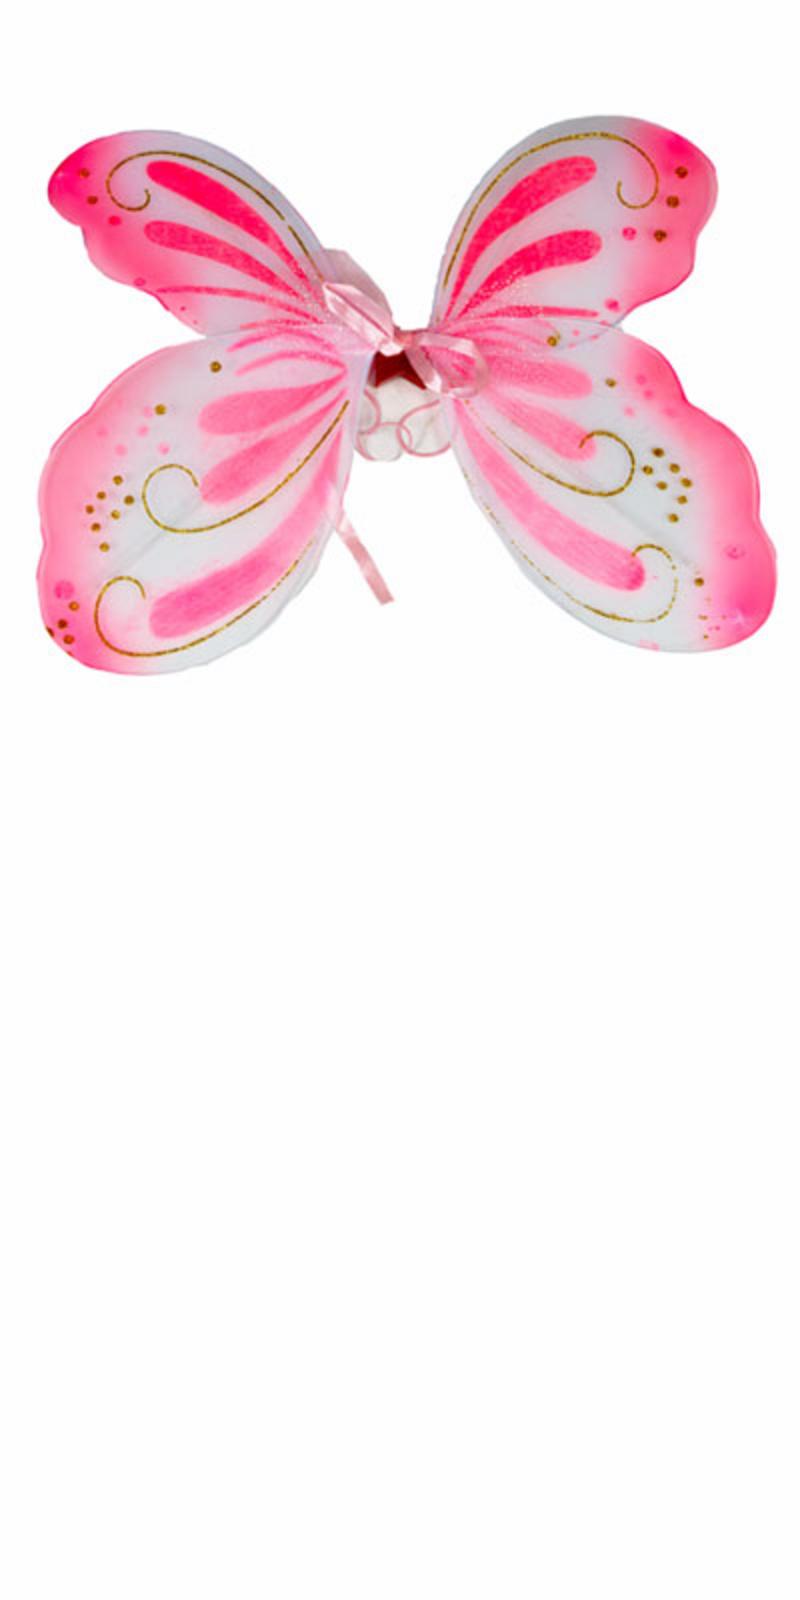 Case of 72 LED Flashing Light Up Fairy Wings Wholesale Job Lot